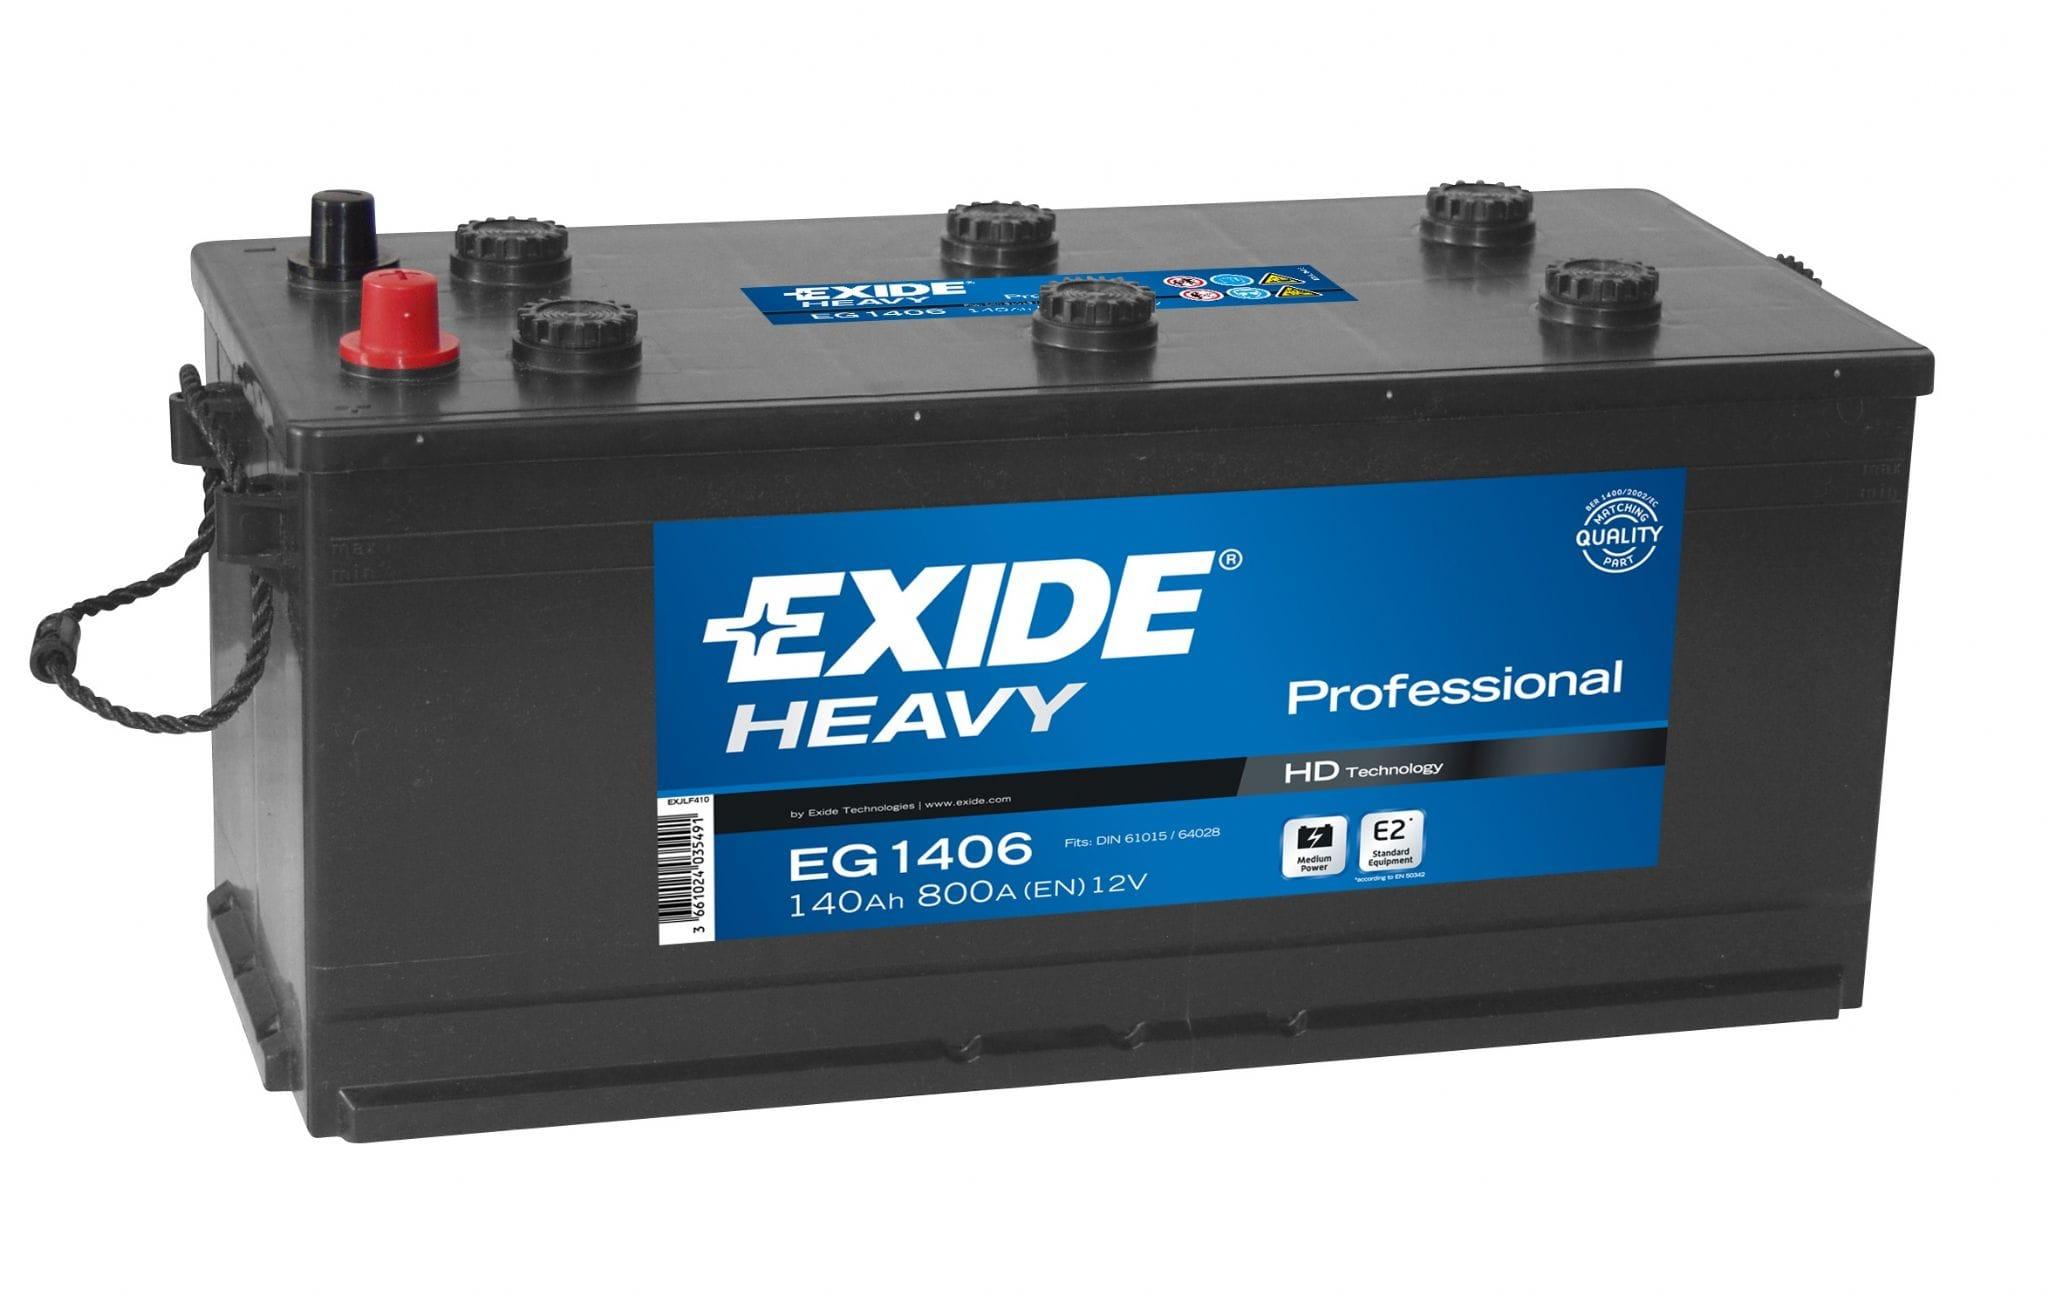 Baterie camion Exide Heavy Professional 140Ah 12V EG1406